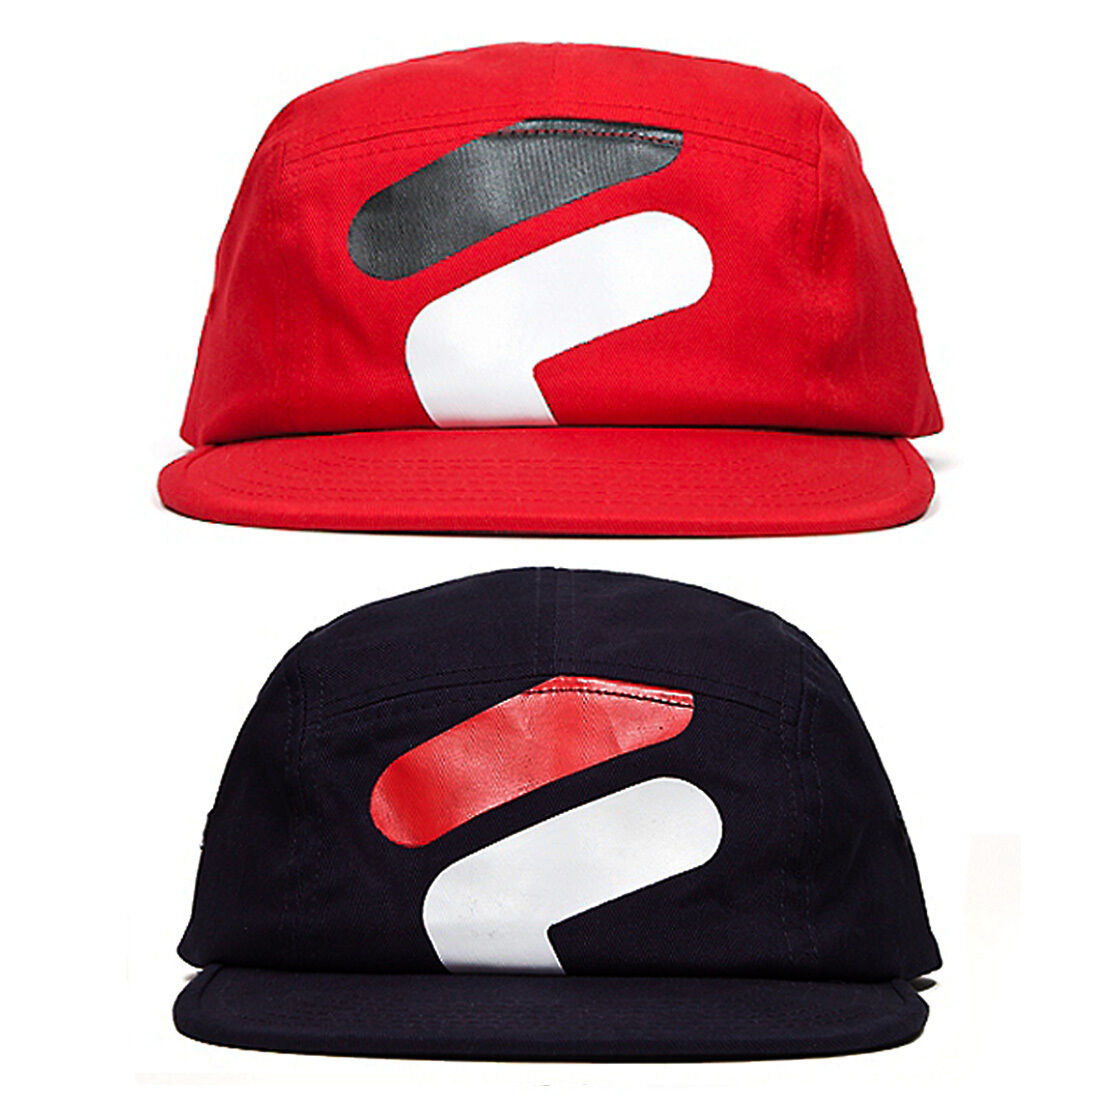 fila hat. new fila vintage 90s throwback style hat 50218 fila hat